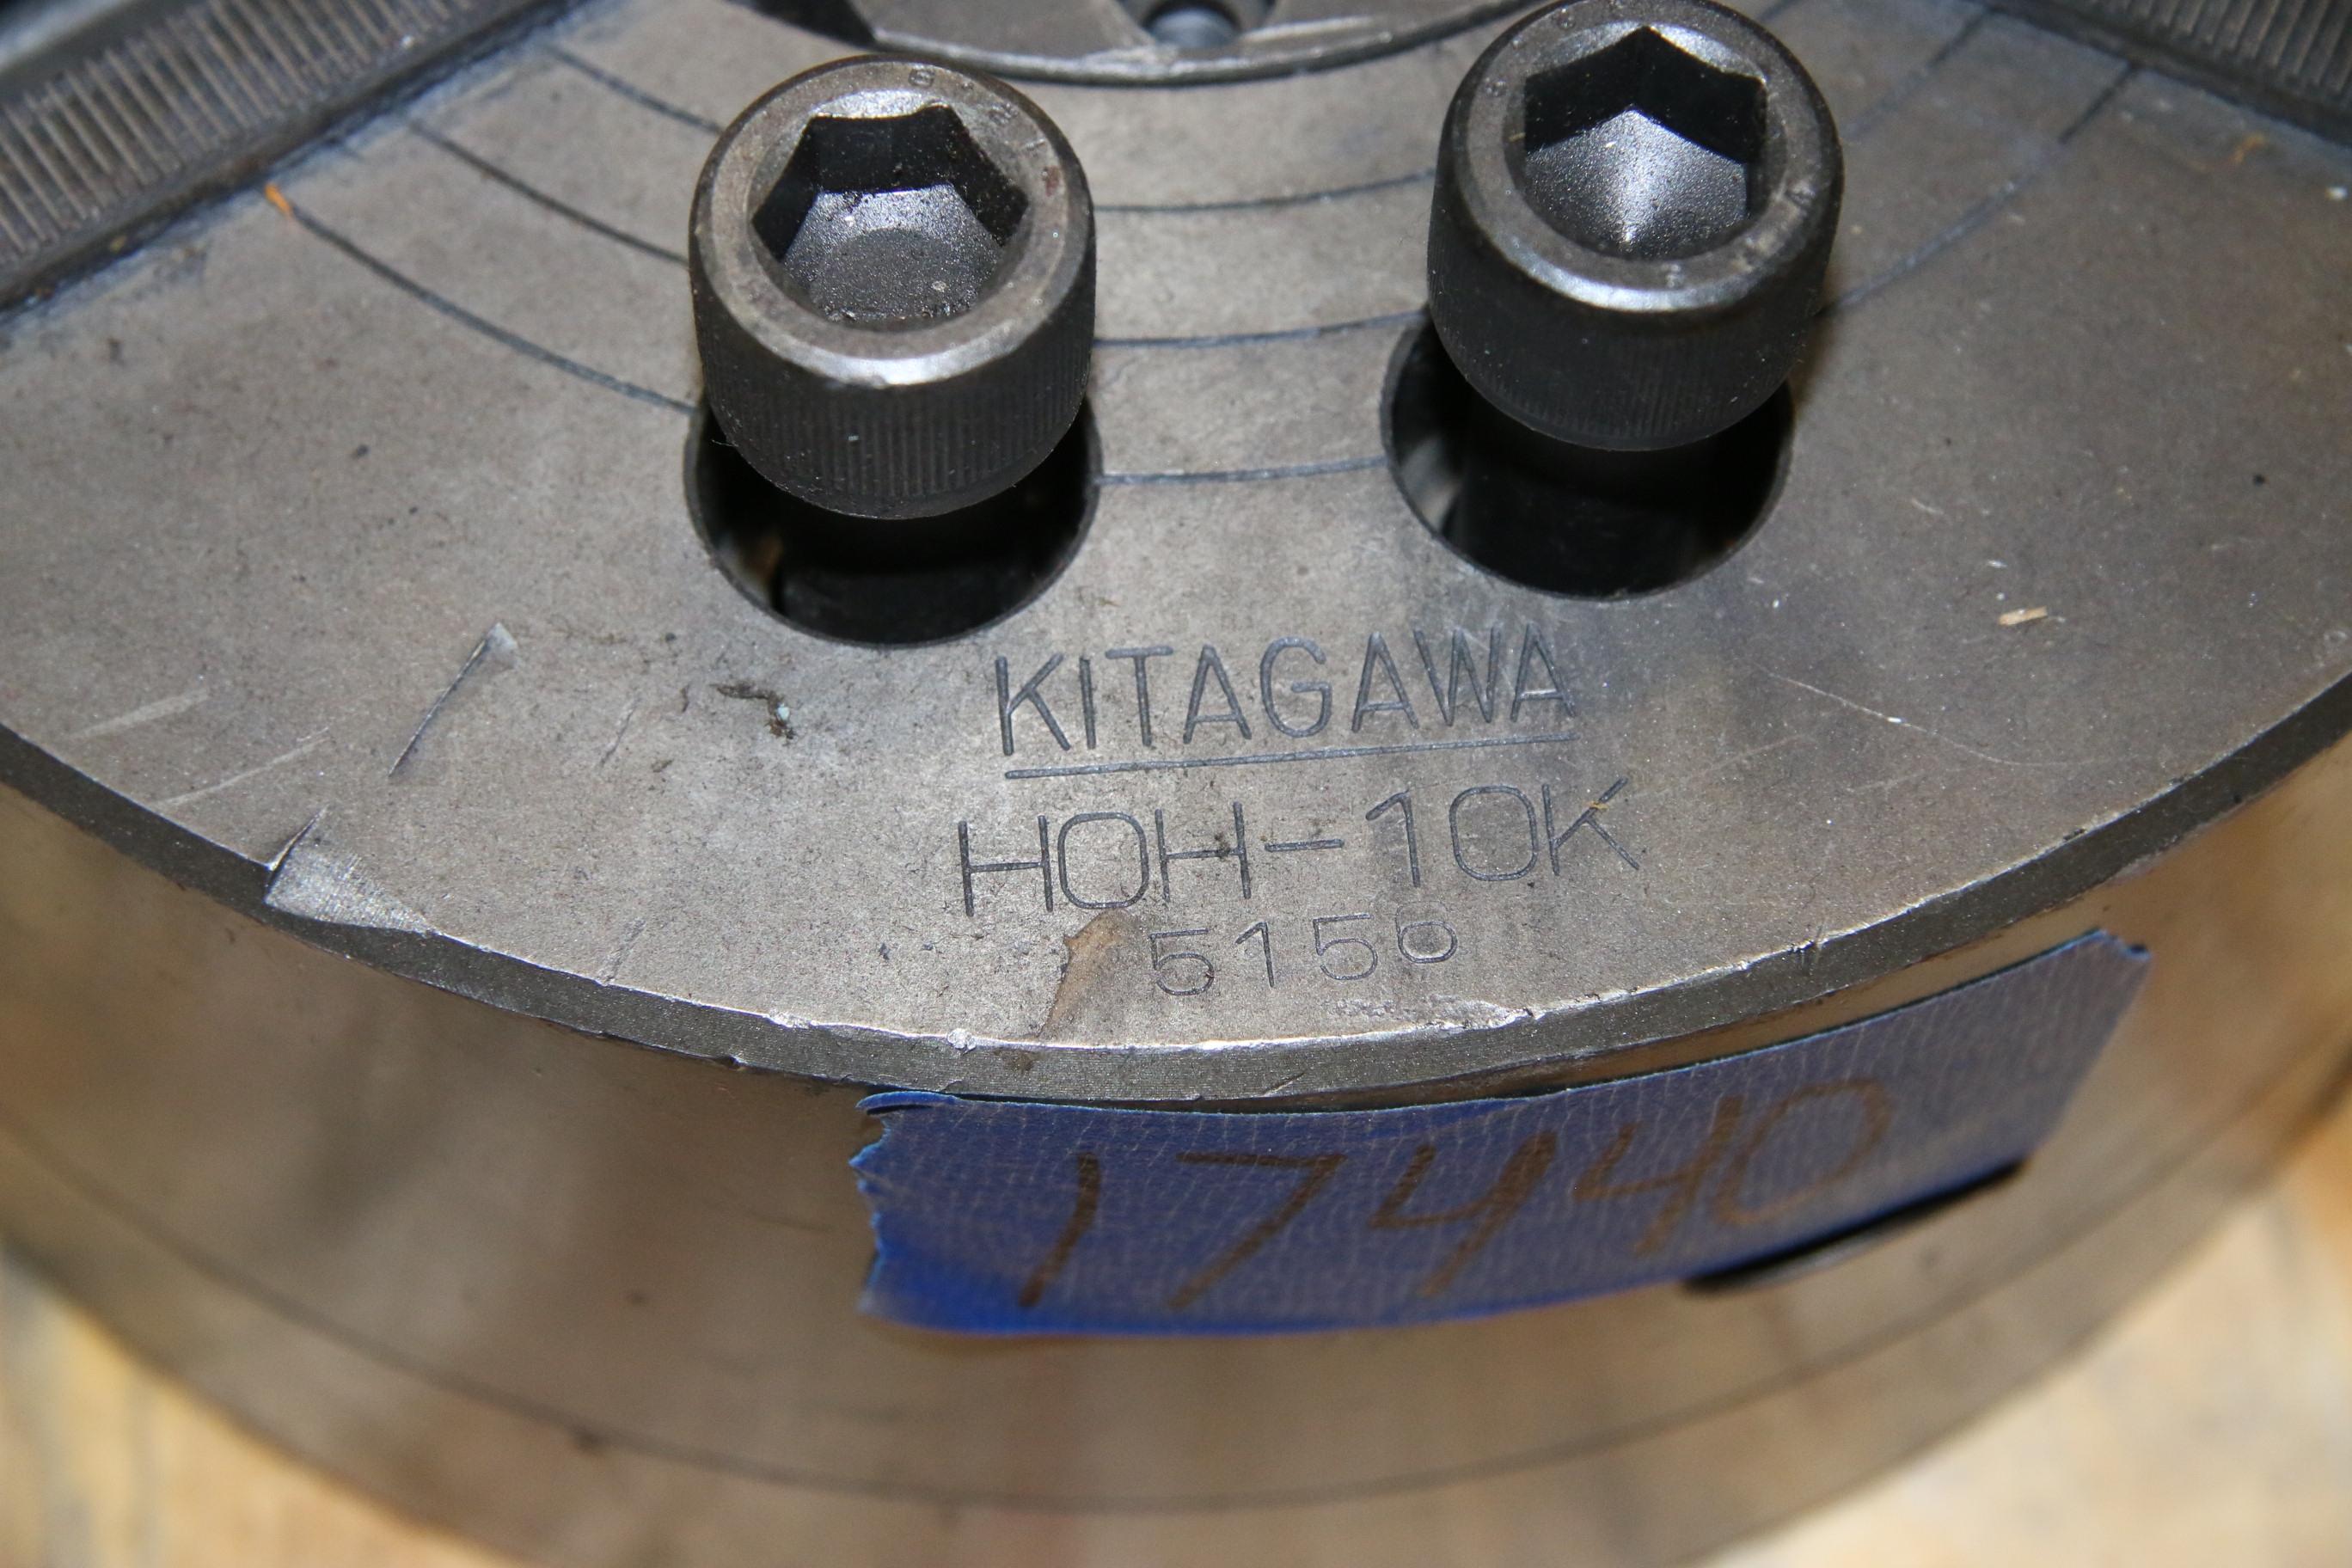 Used Kitagawa HOH-10K 5150 10″ 3 Jaw Chuck 17440